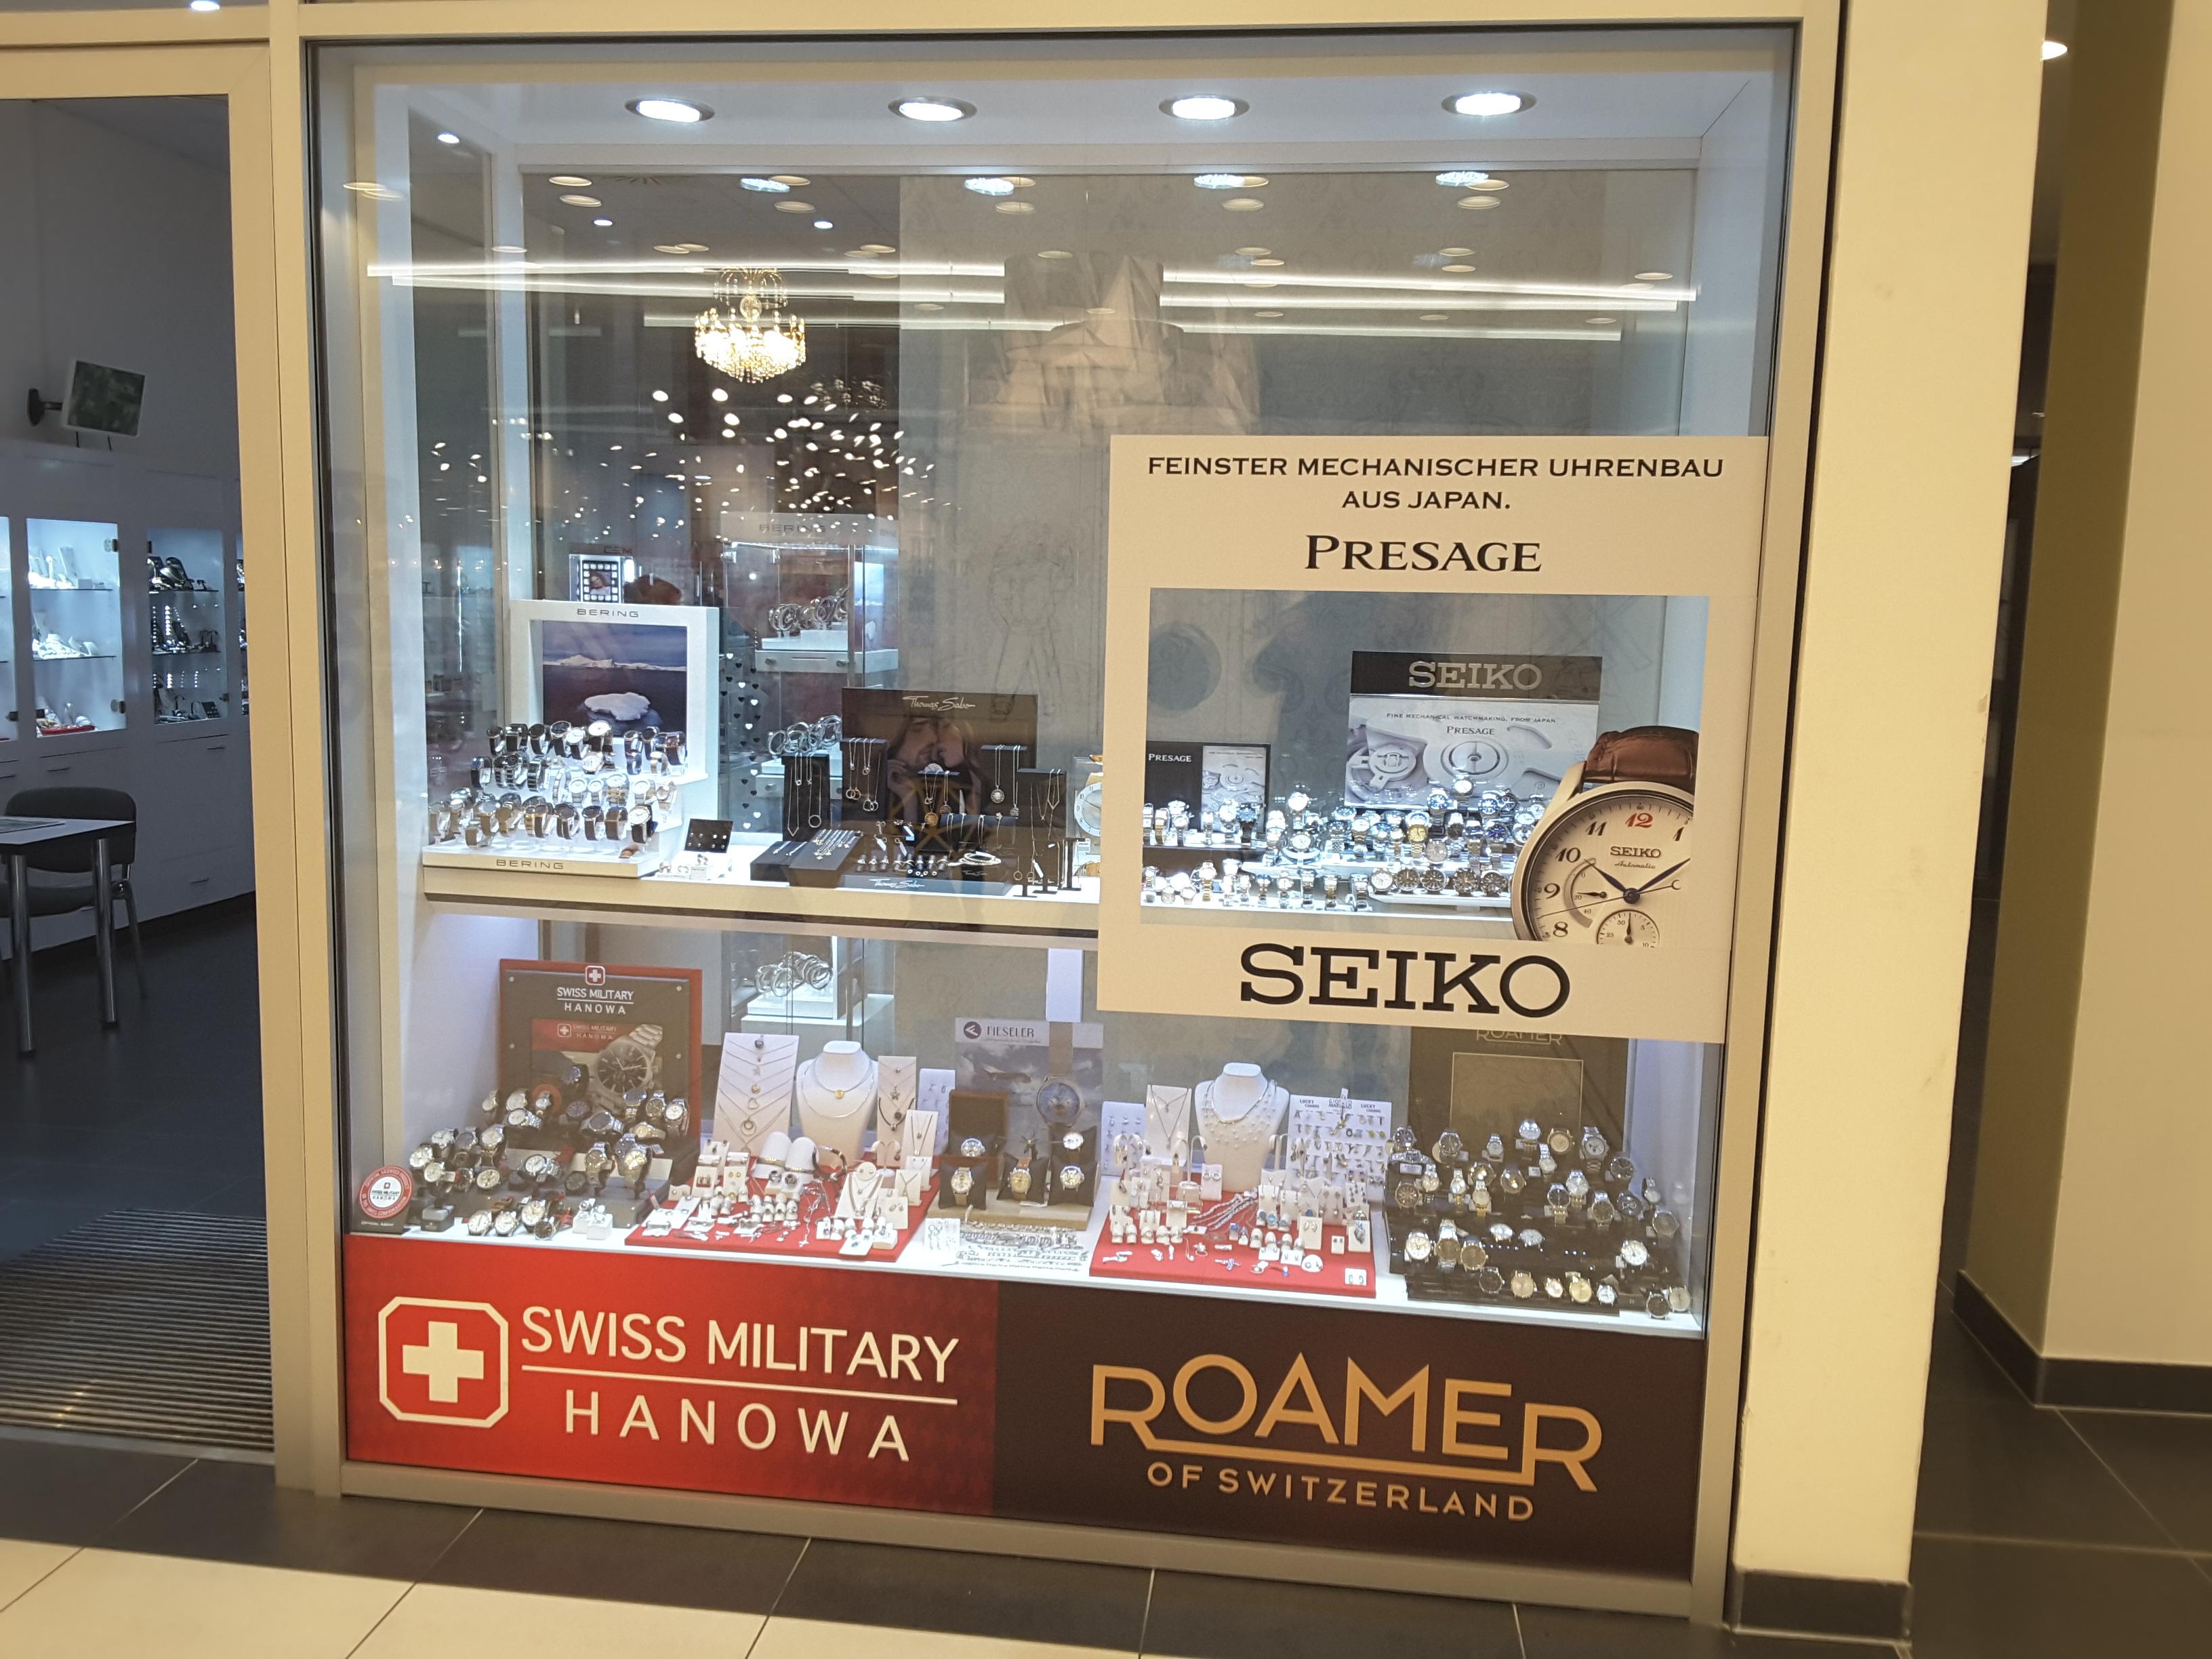 Fotos de Juwelier im LIO GmbH